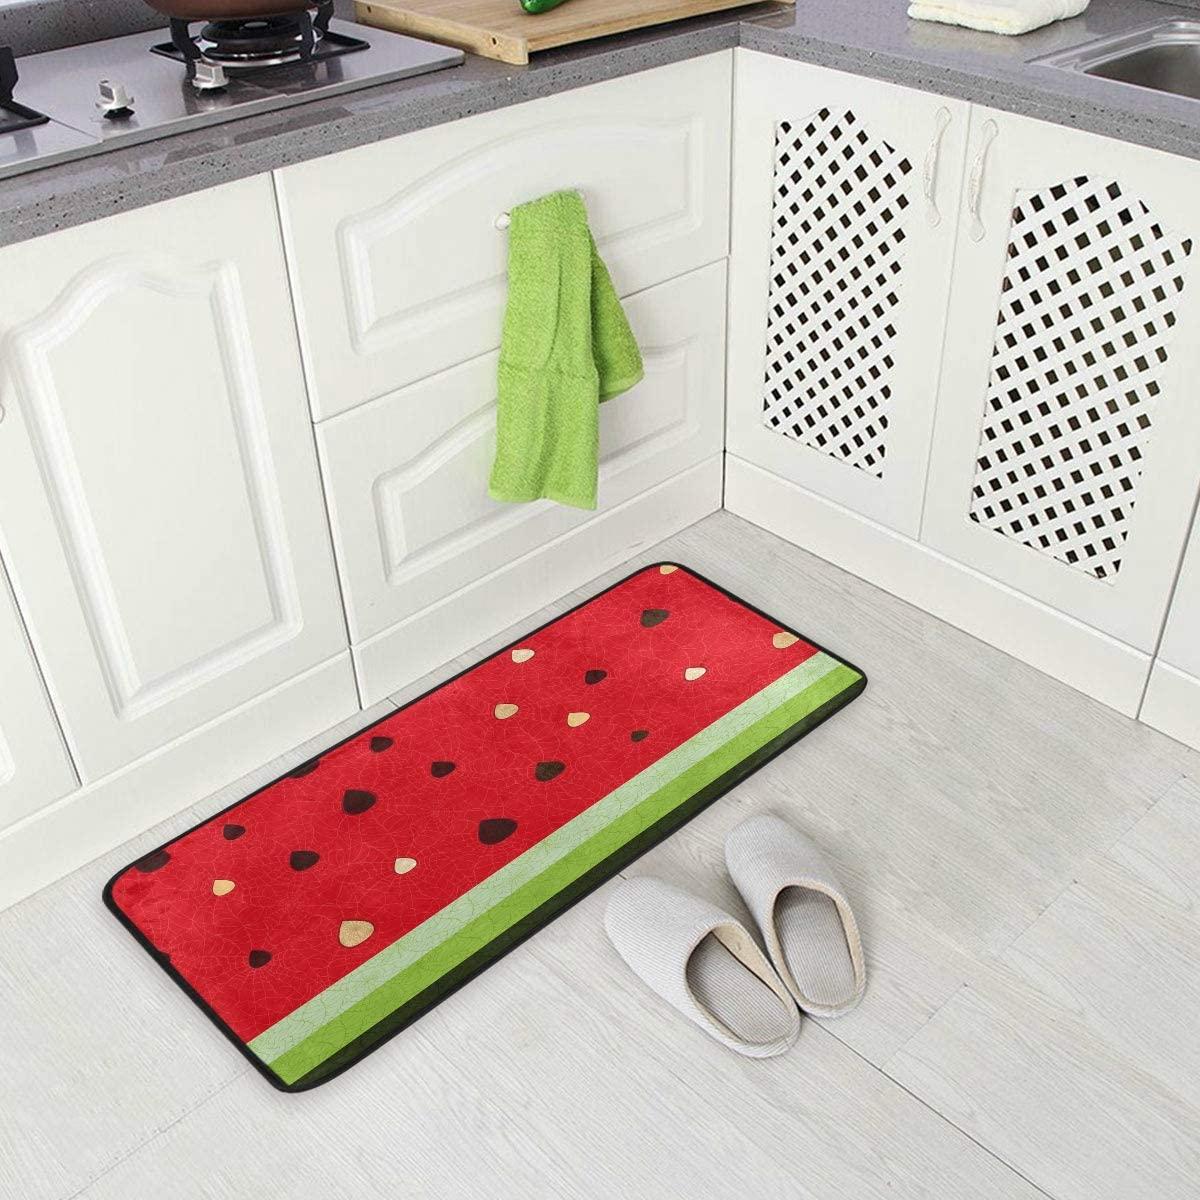 ALAZA Fruit Watermelon Juice Seed Non Slip Kitchen Floor Mat Kitchen Rug for Entryway Hallway Bathroom Living Room Bedroom 39 x 20 inches(1.7' x 3.3')